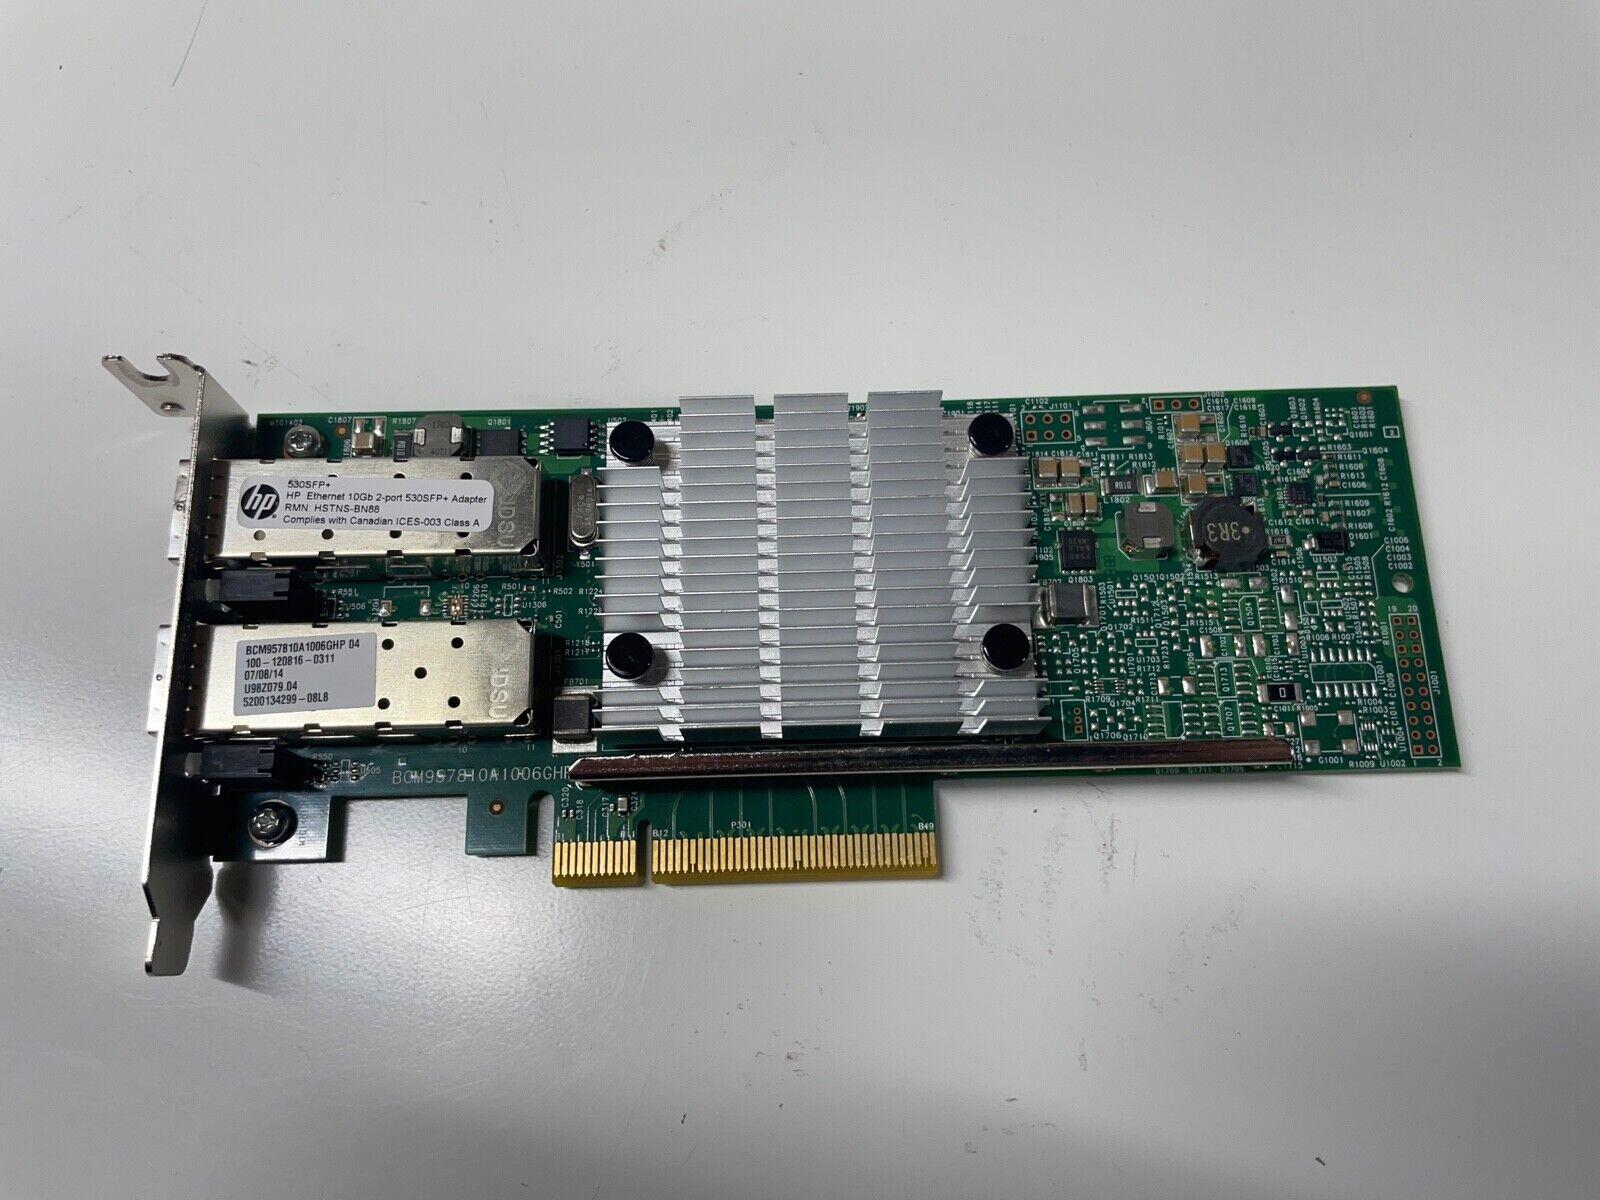 HP 656244-001 Ethernet 10Gb Dual Port 530SFP+ PCIe Adapter Card Full Profile